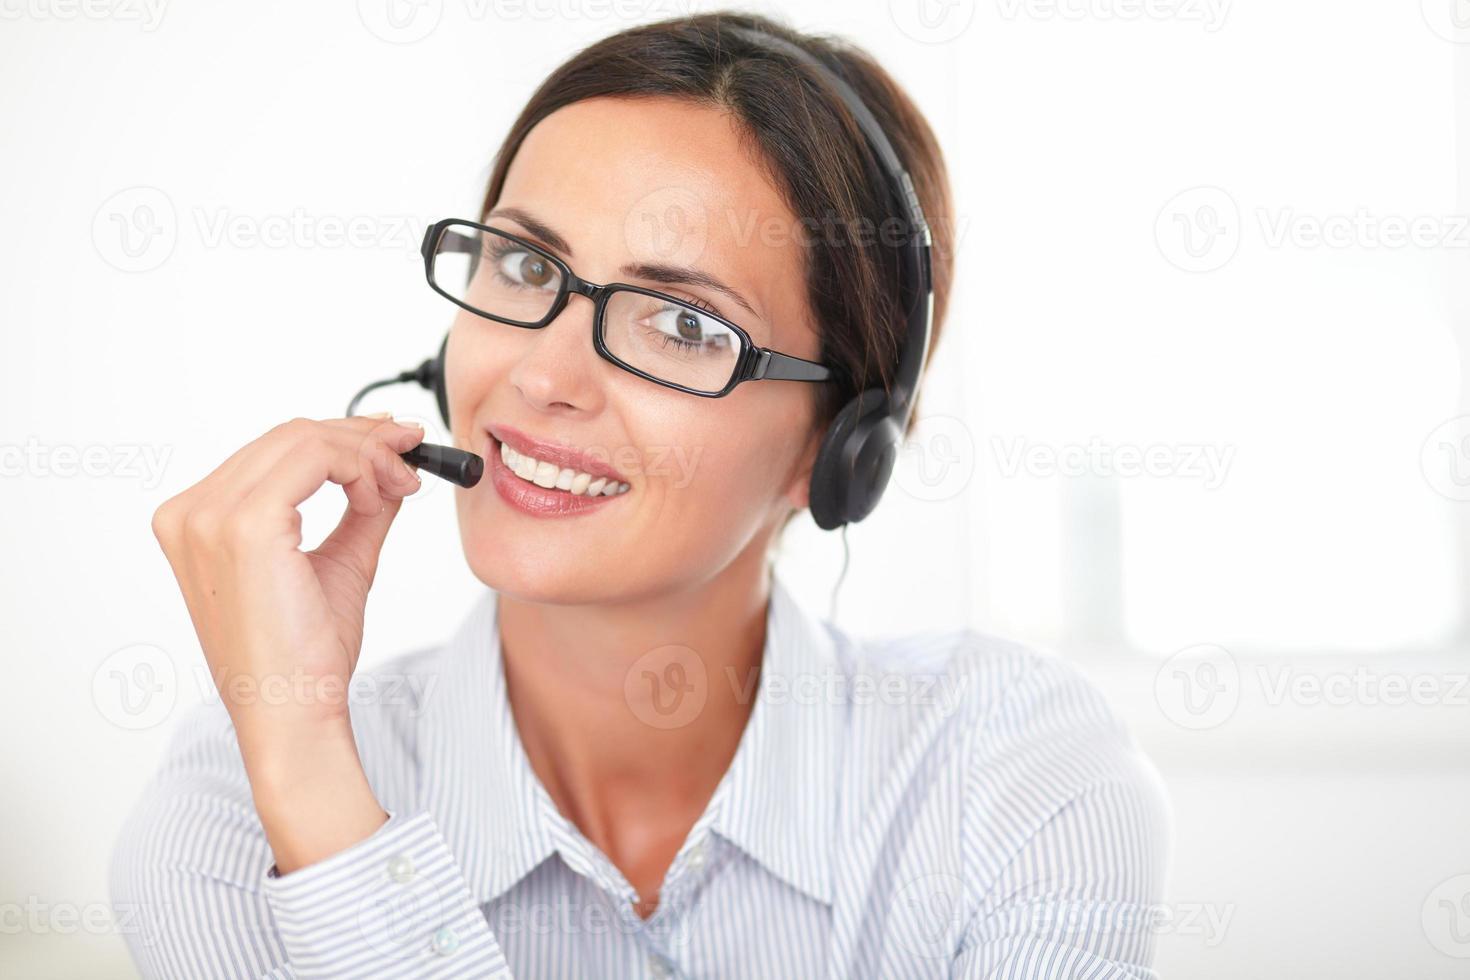 jonge bedrijfsmedewerker die op hoofdtelefoons spreekt foto